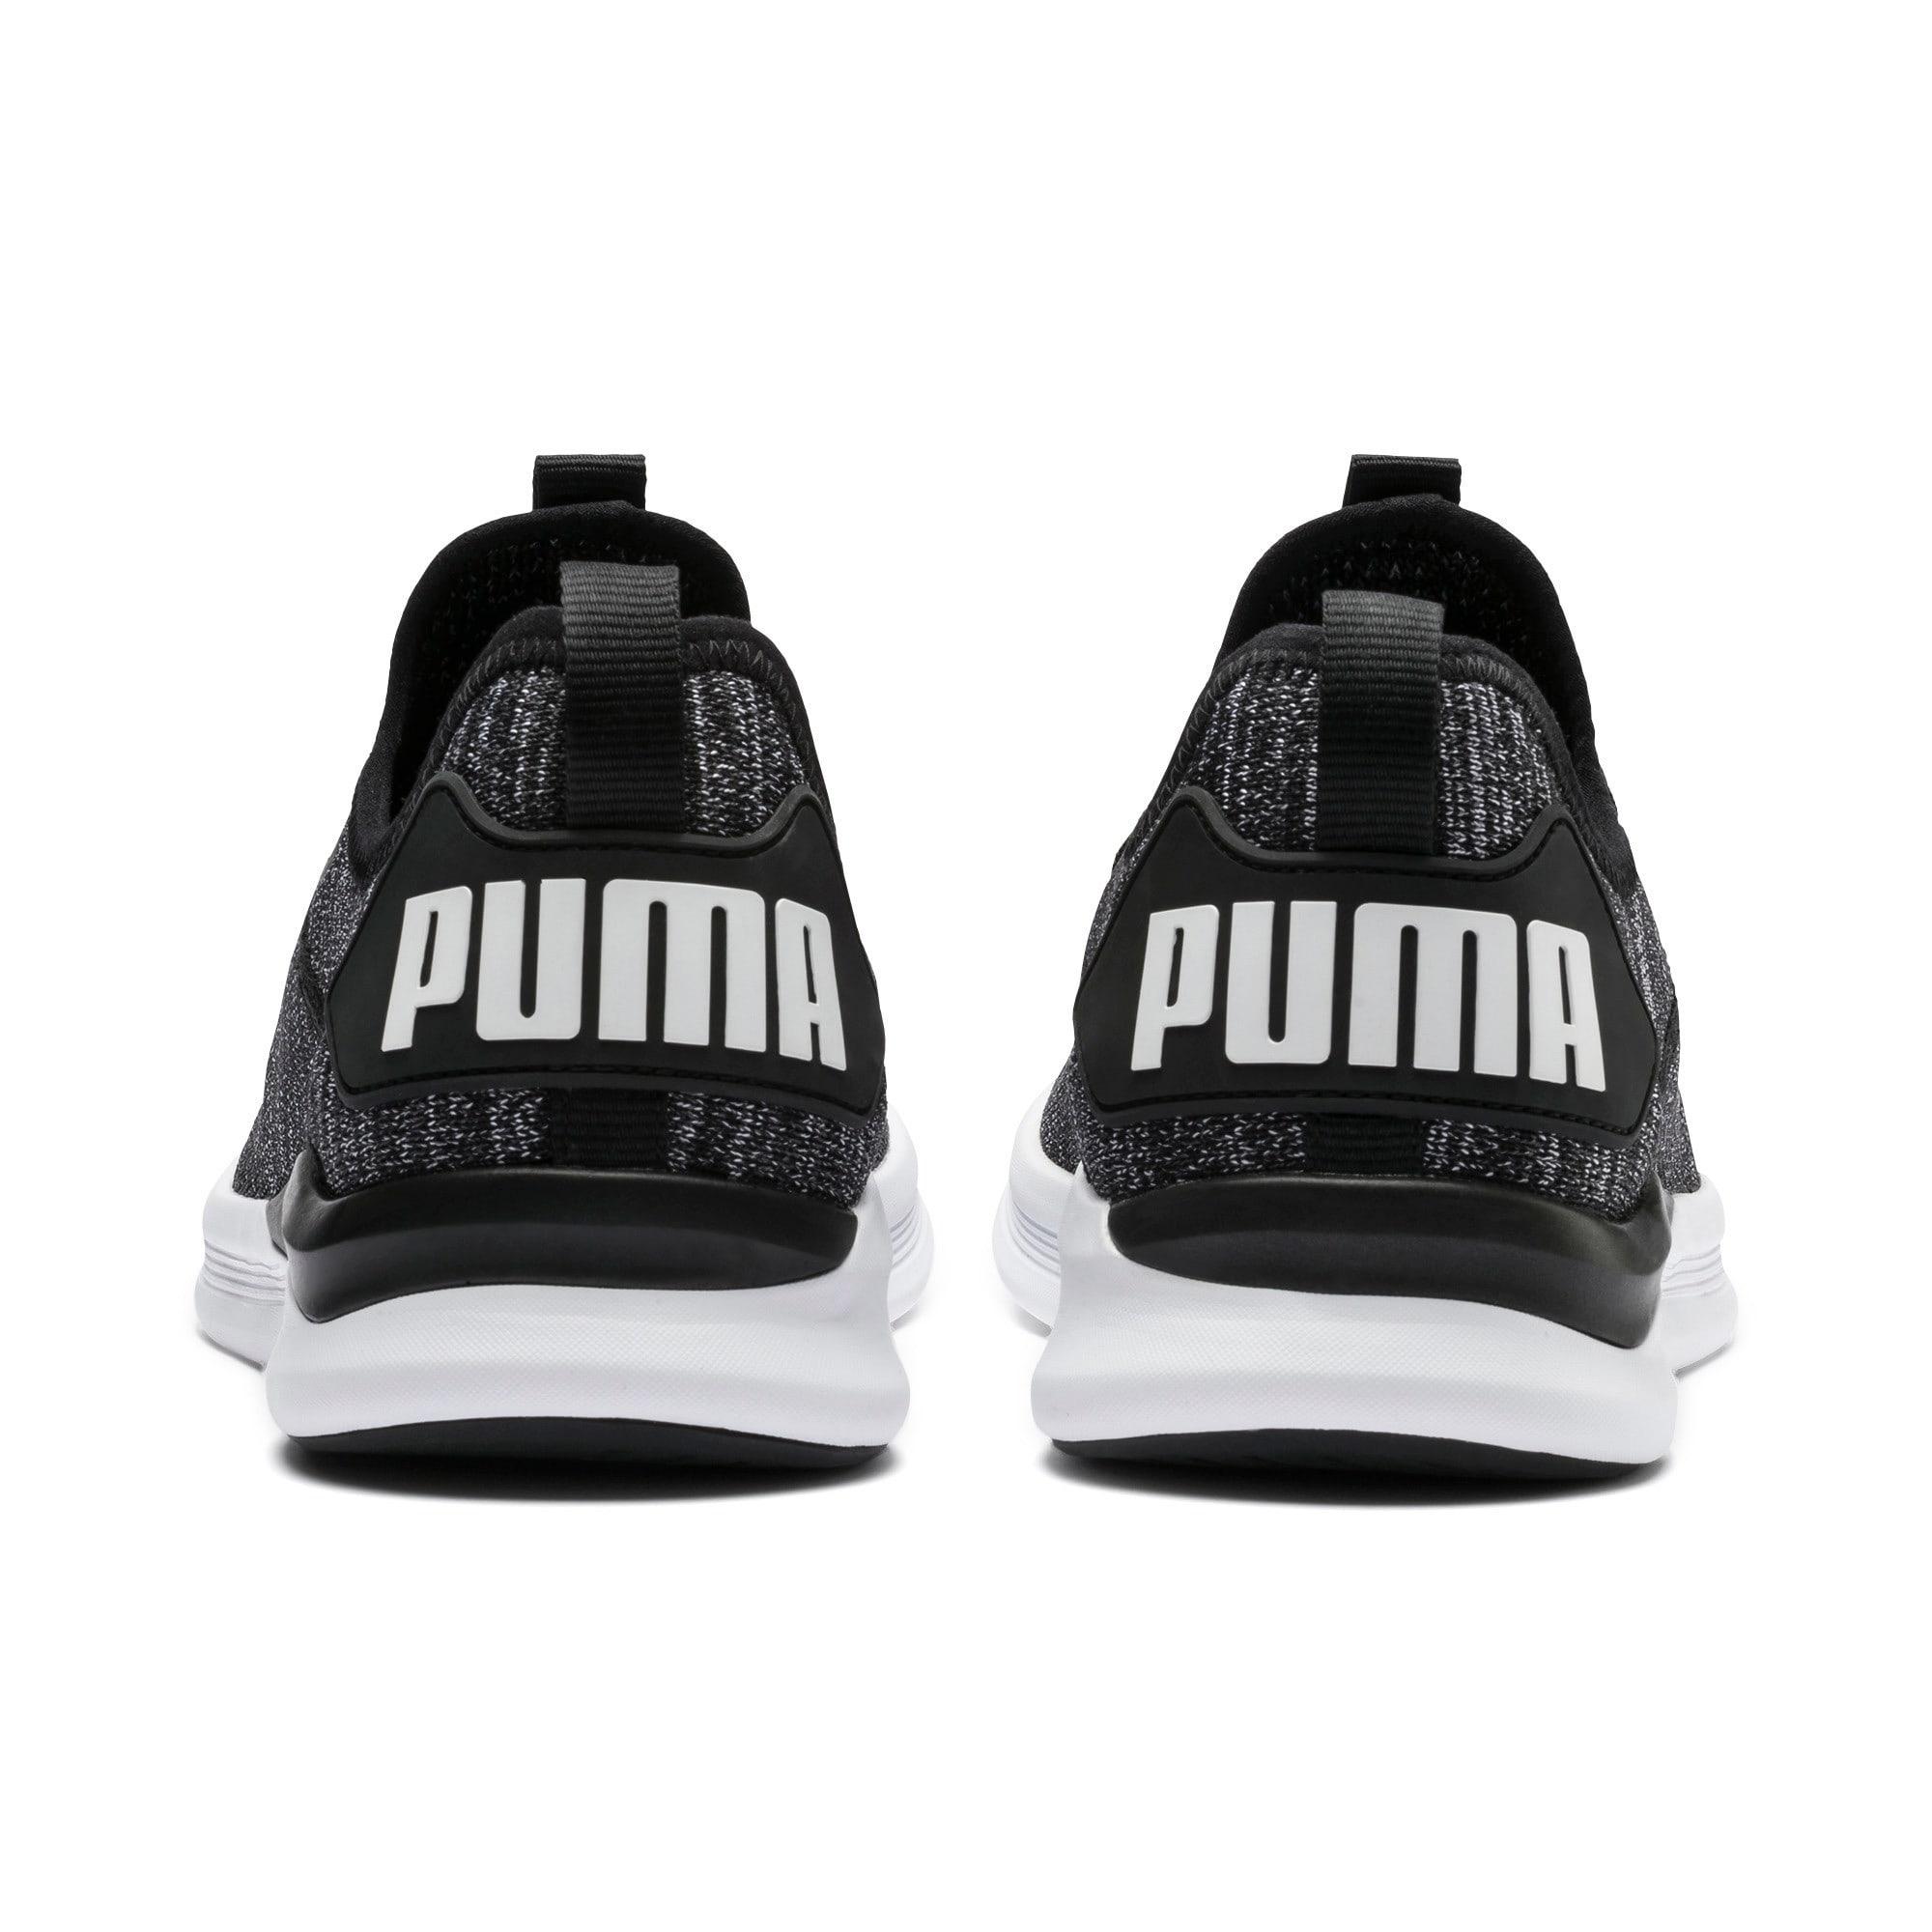 Thumbnail 3 of IGNITE Flash evoKNIT sportschoenen voor heren, Black-Asphalt-White, medium